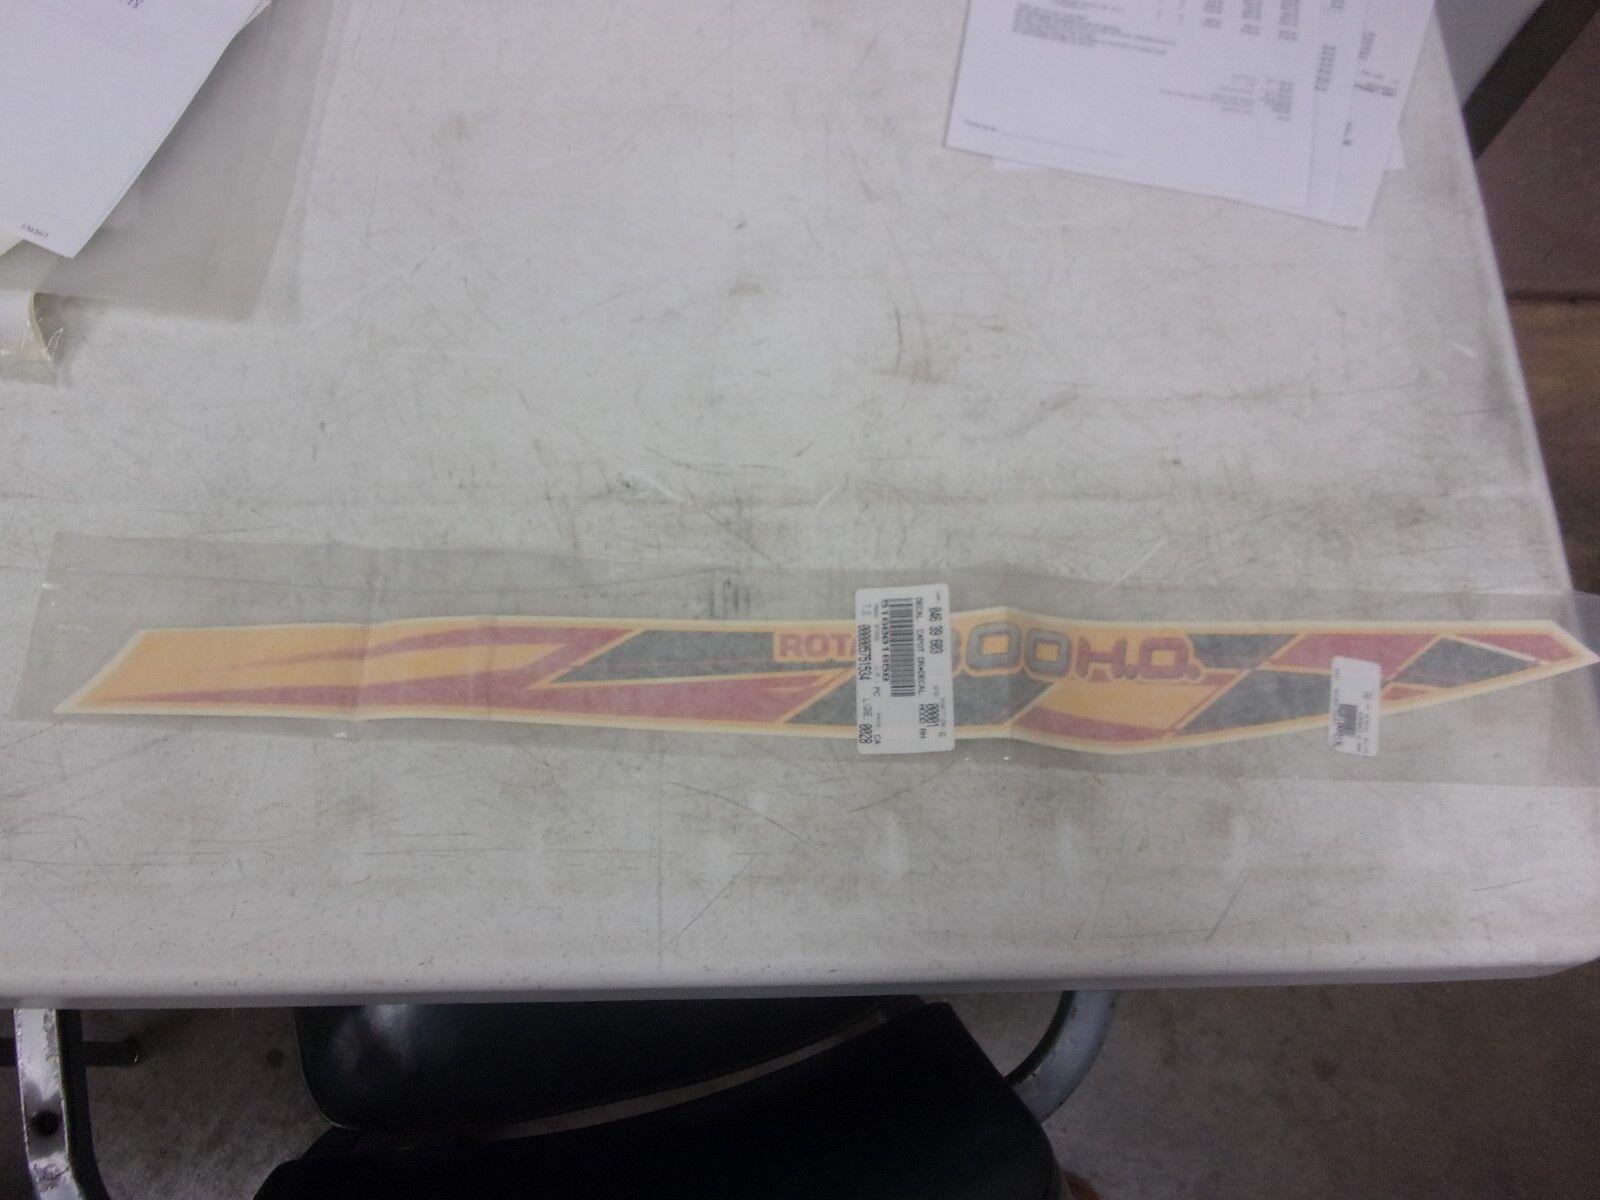 Ski-doo Snowmobile RH Hood Decal 800 HO 516001858